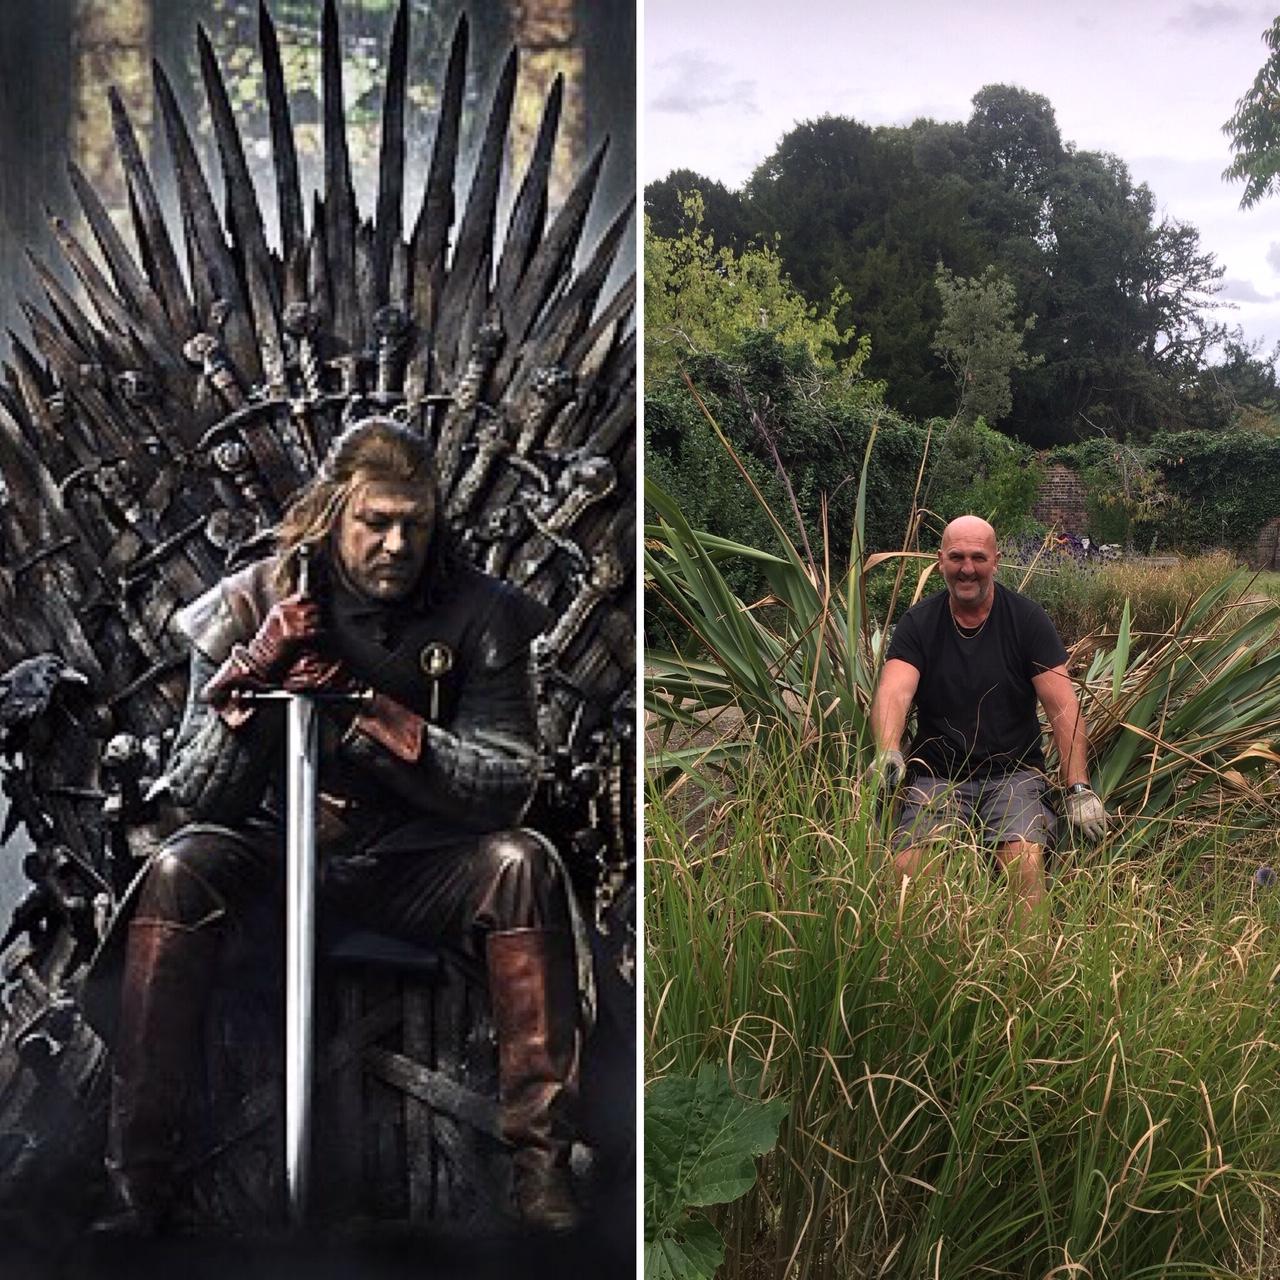 David and the Iron Throne